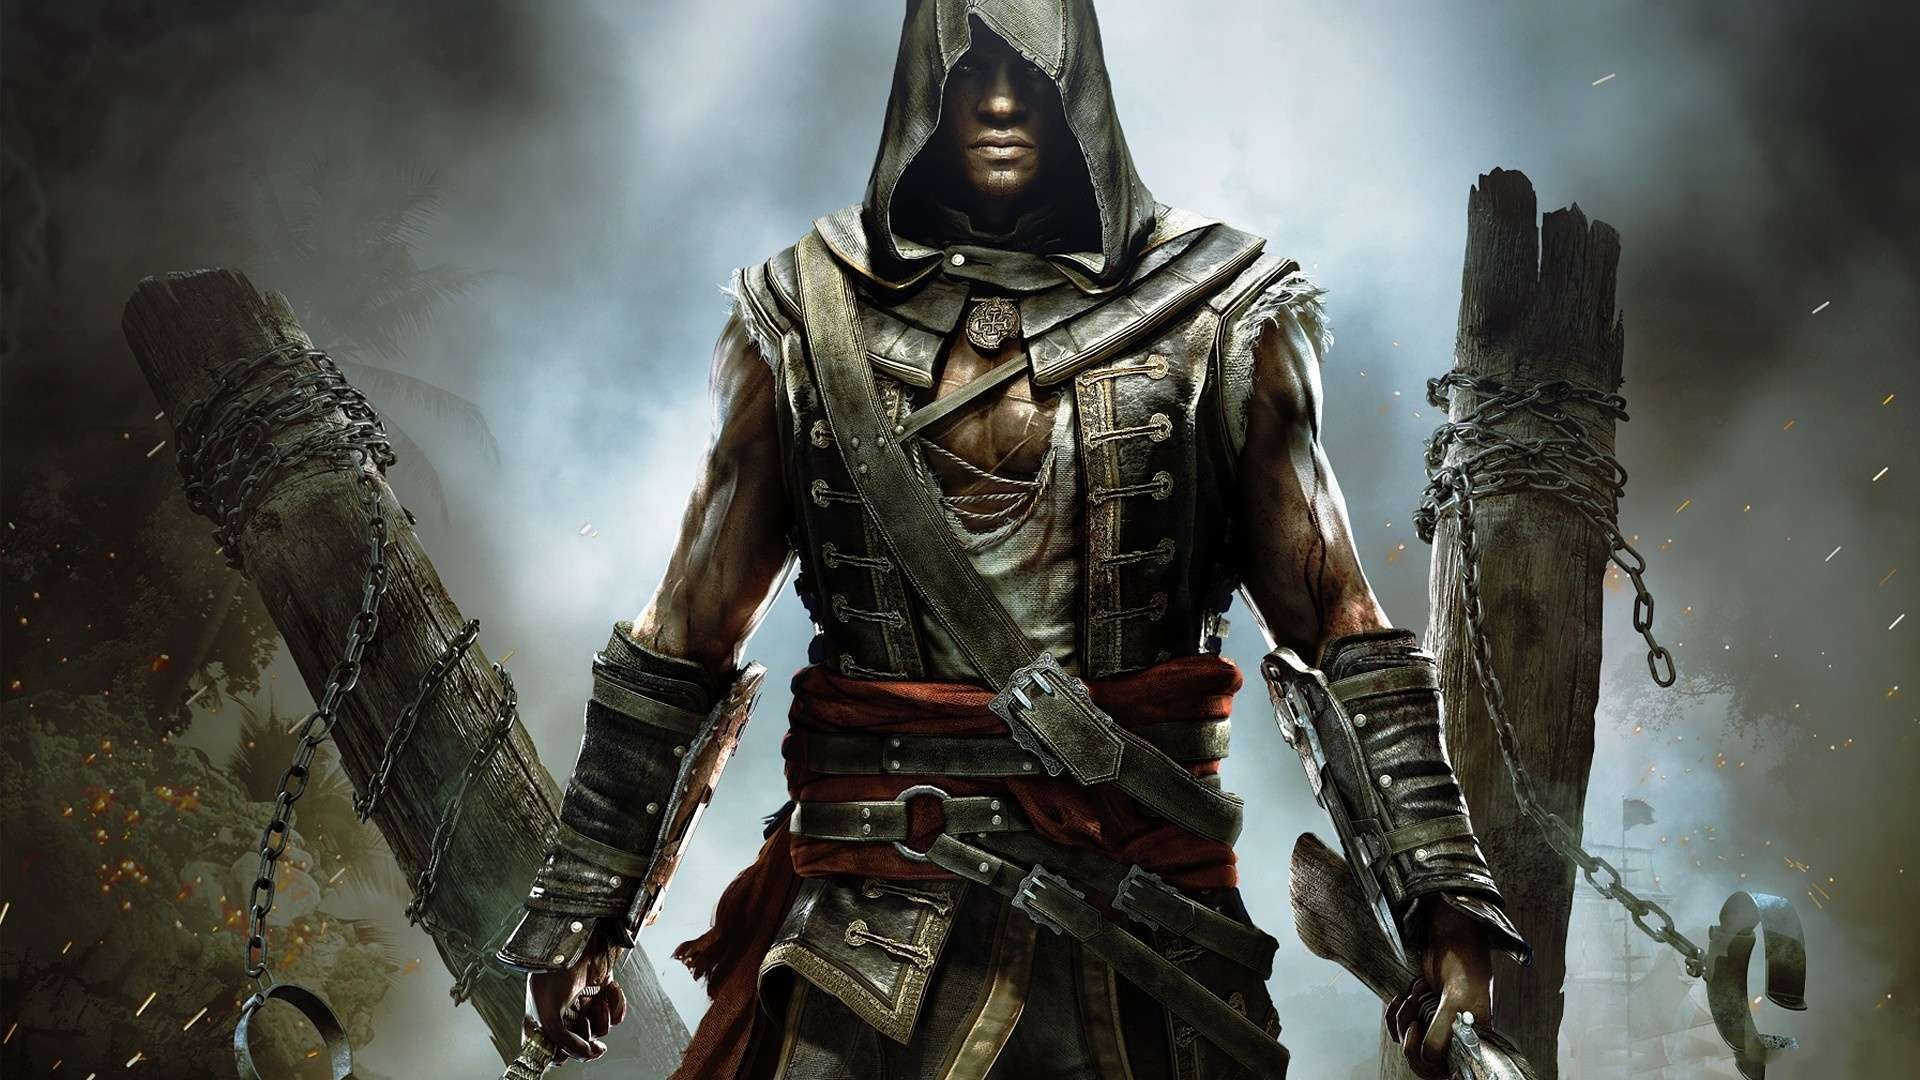 Assassins Creed All Assassins Wallpaper (88+ Images